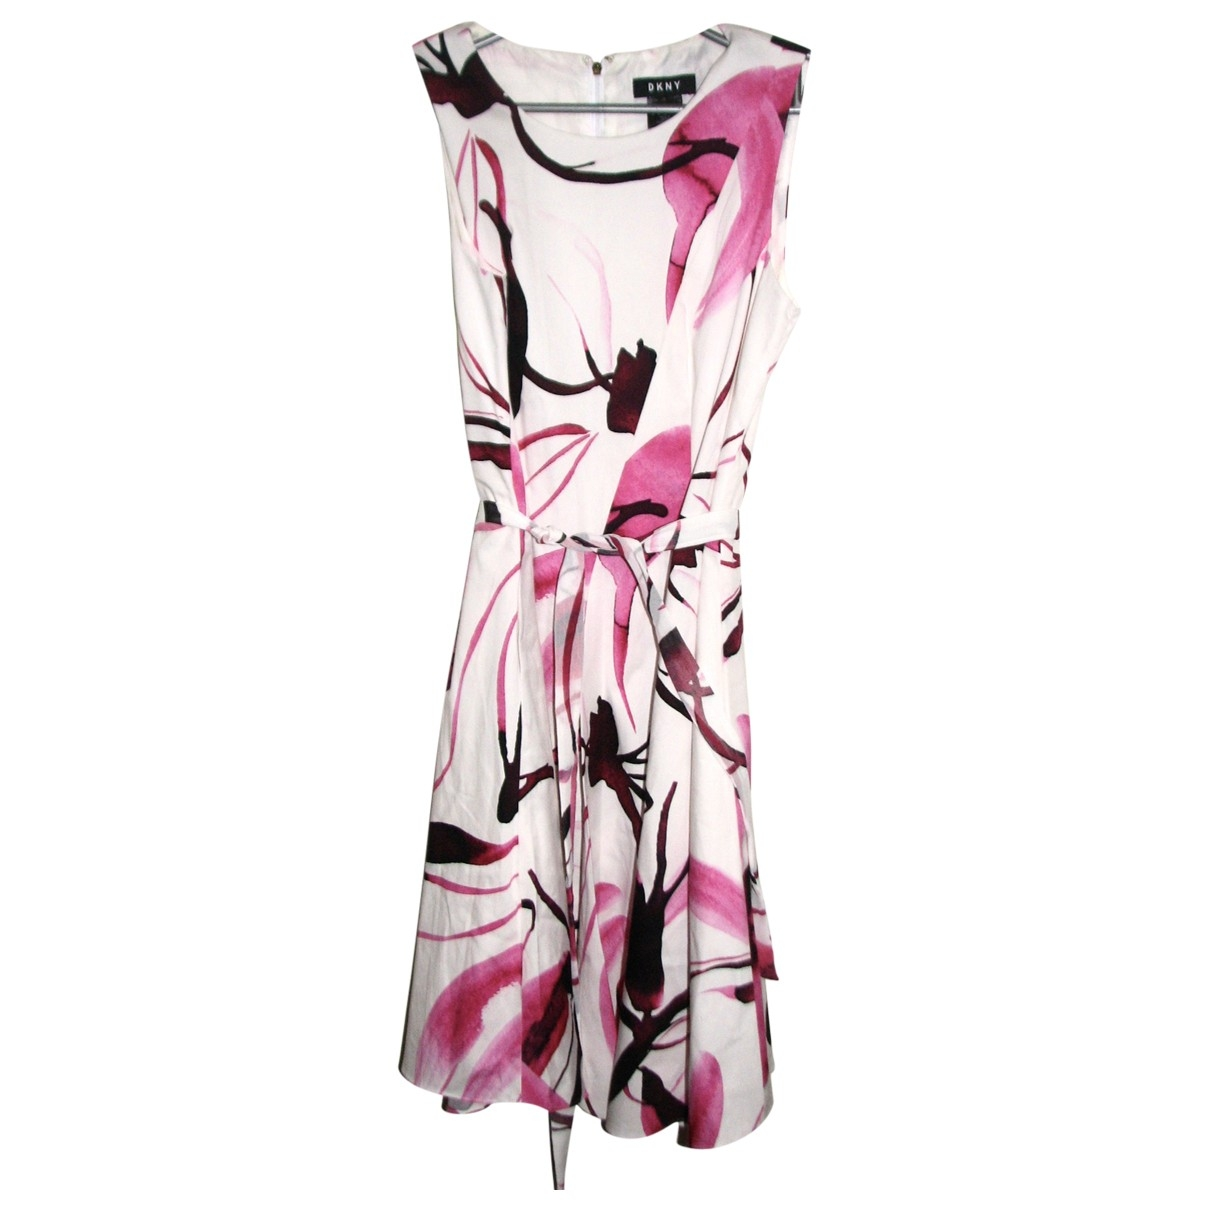 Dkny - Robe   pour femme en coton - elasthane - multicolore